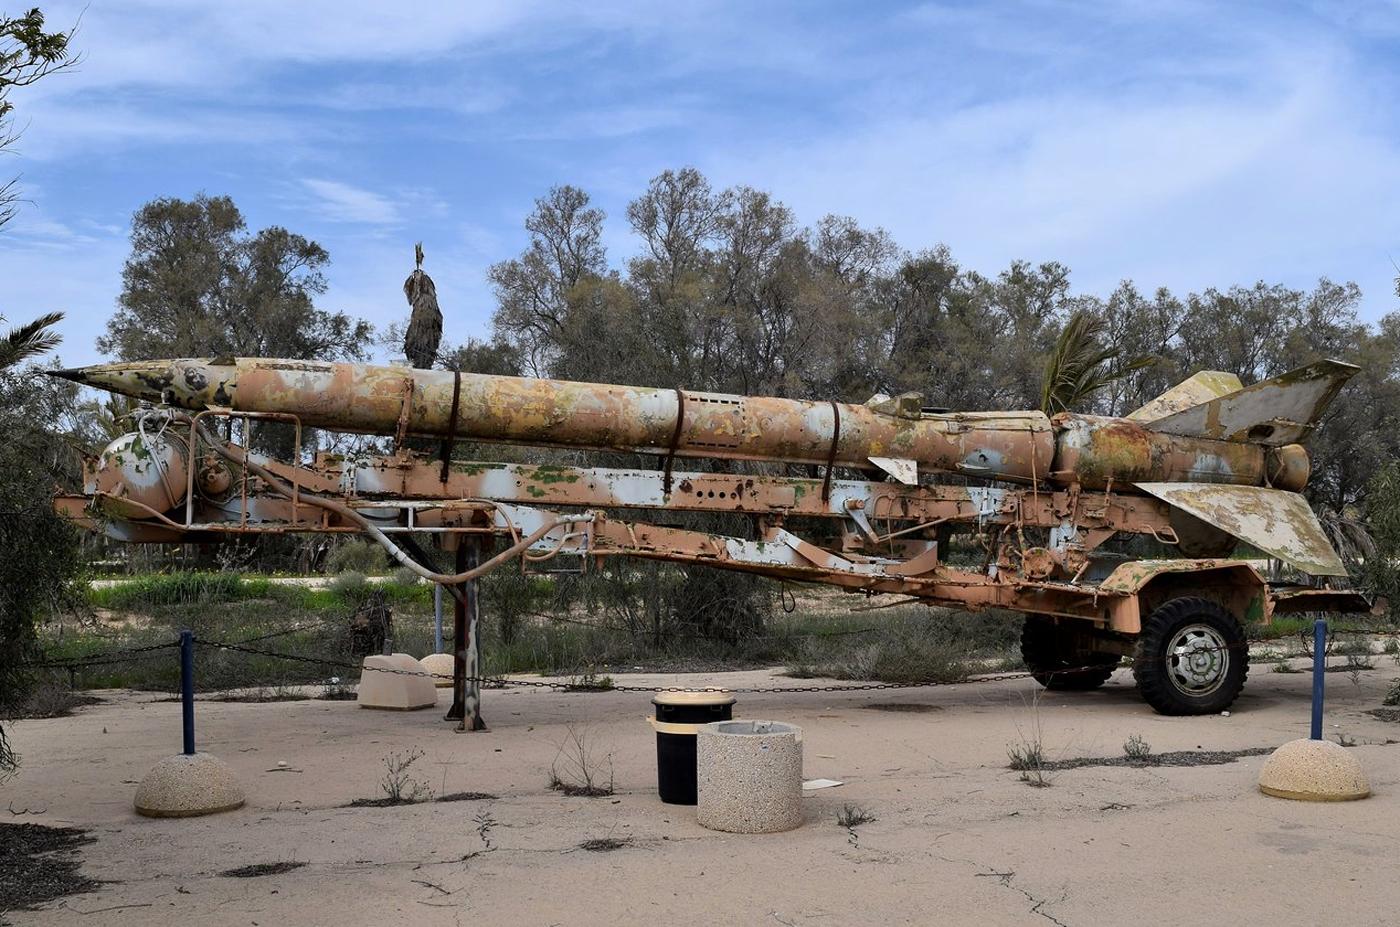 Ракета в музее авиации Израиля